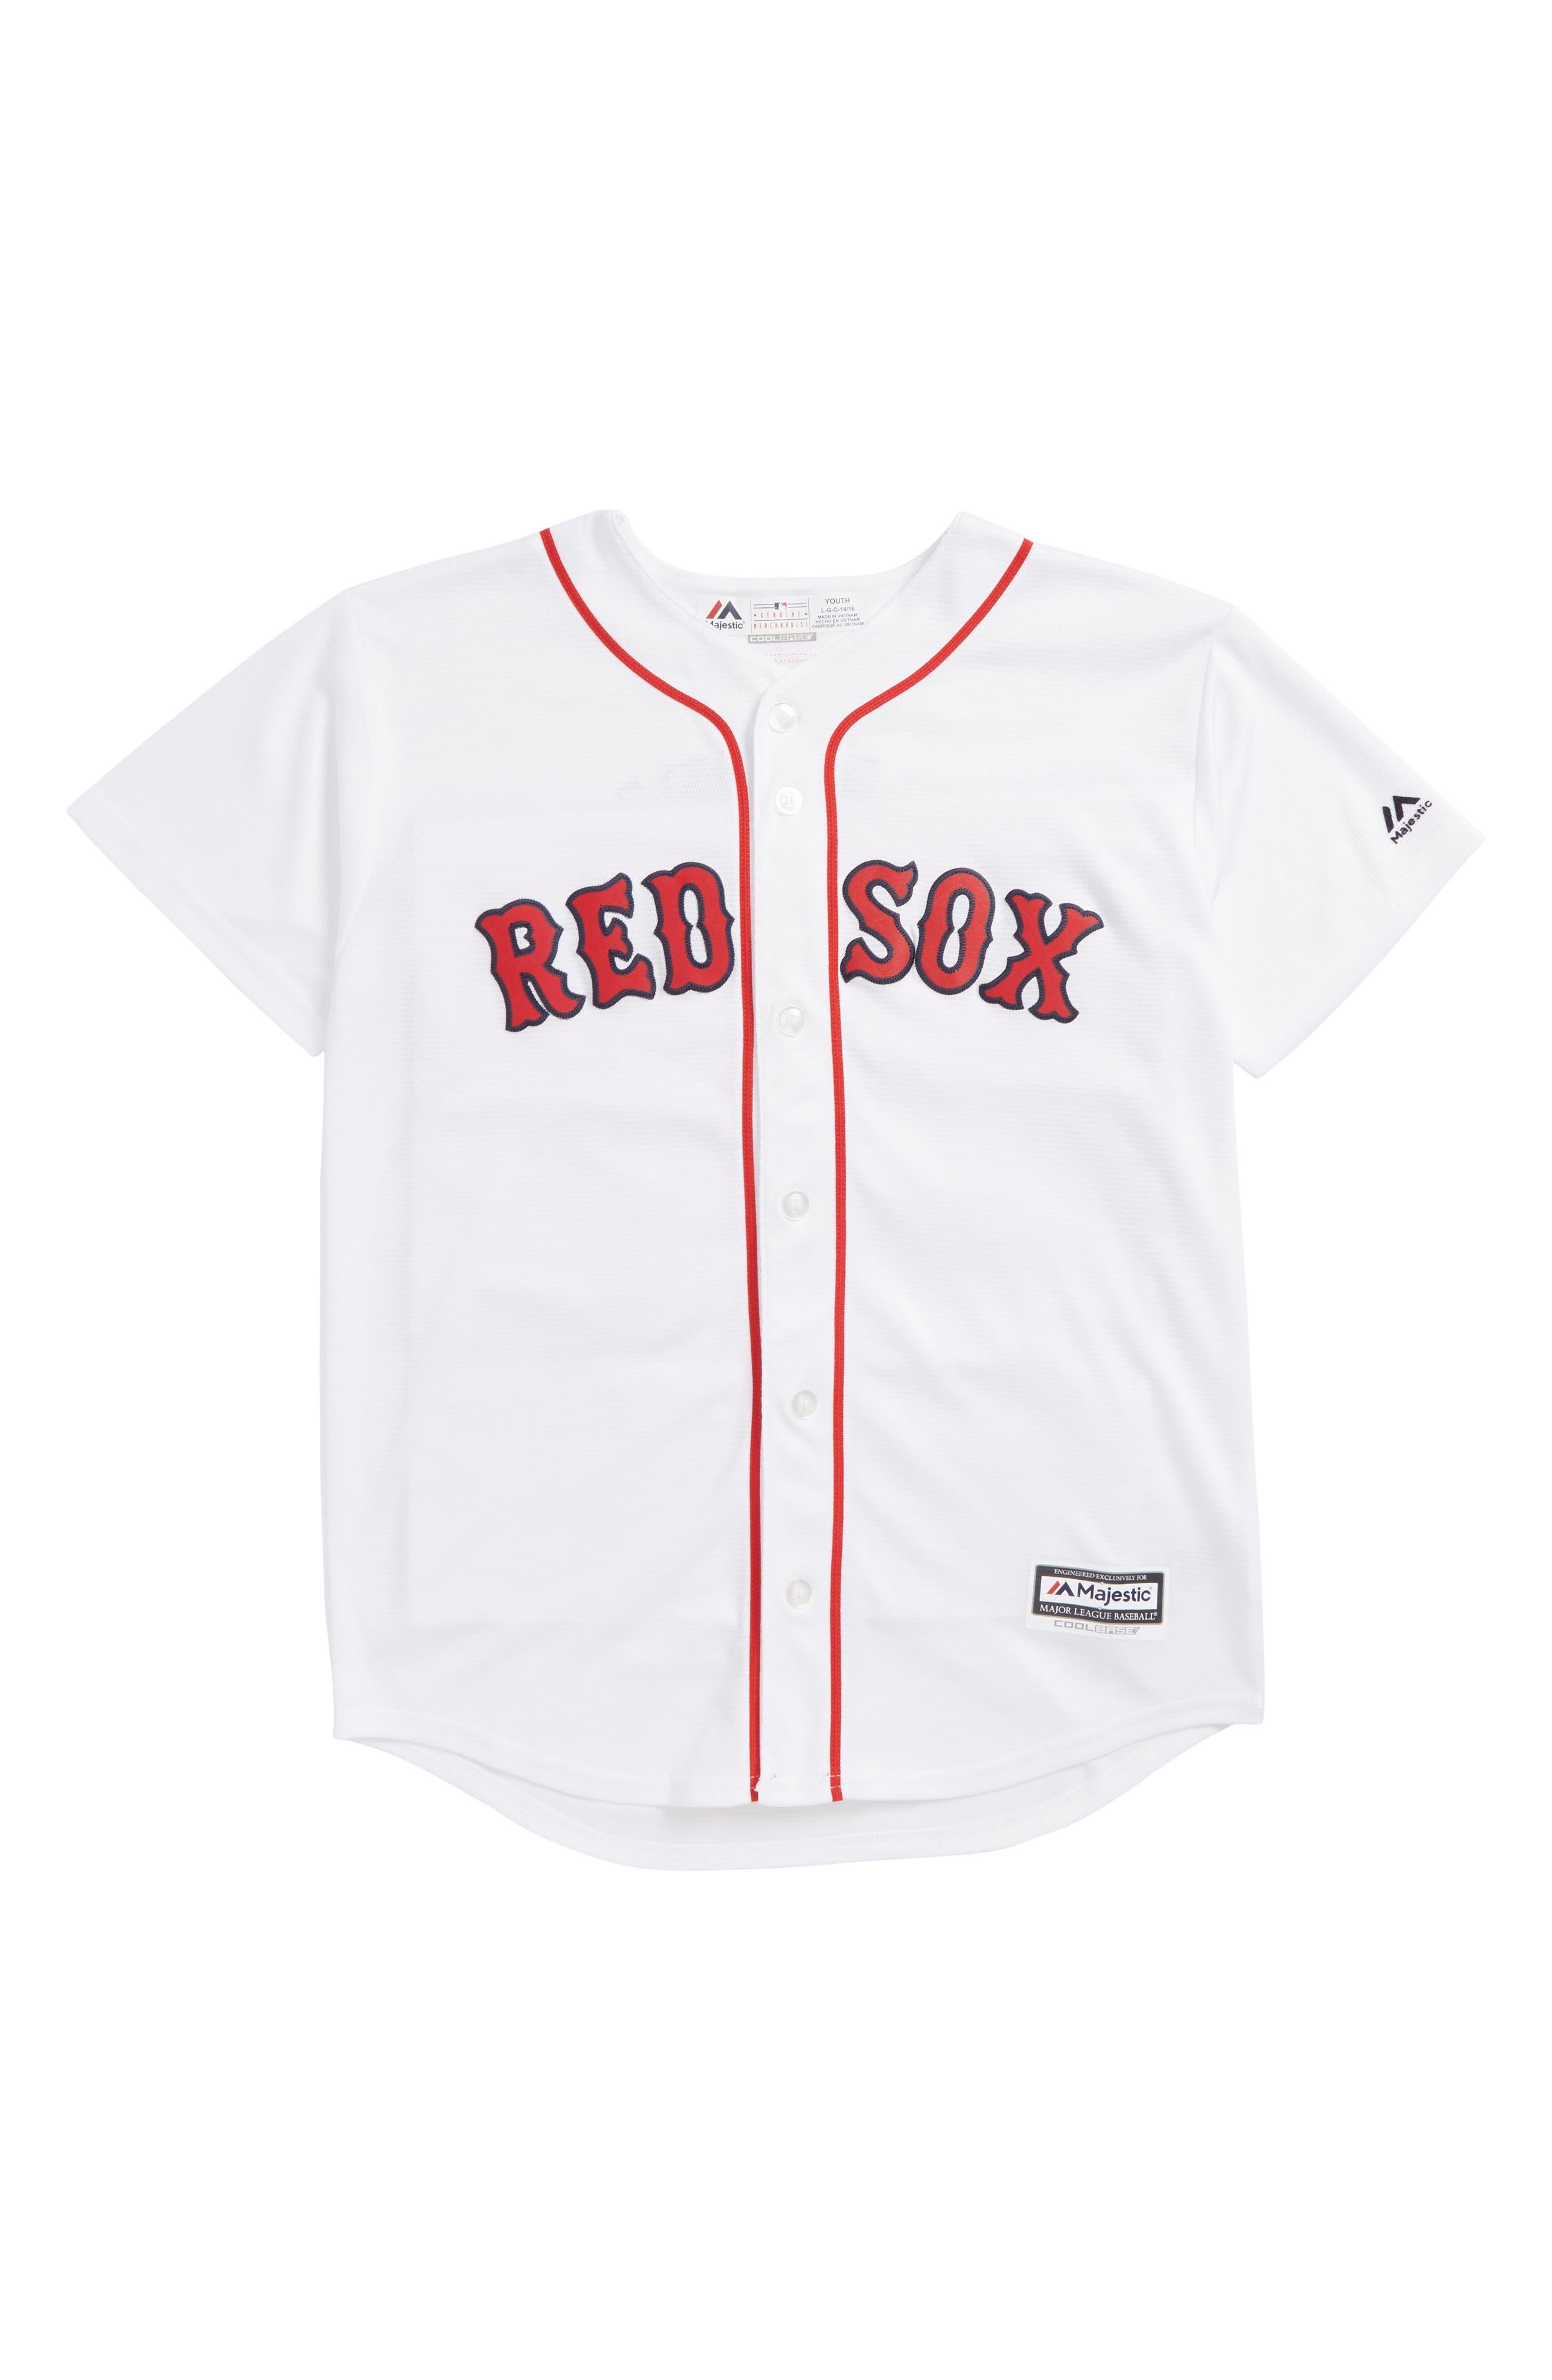 Boston Red Sox - Dustin Pedroia Baseball Jersey,                             Main thumbnail 1, color,                             White